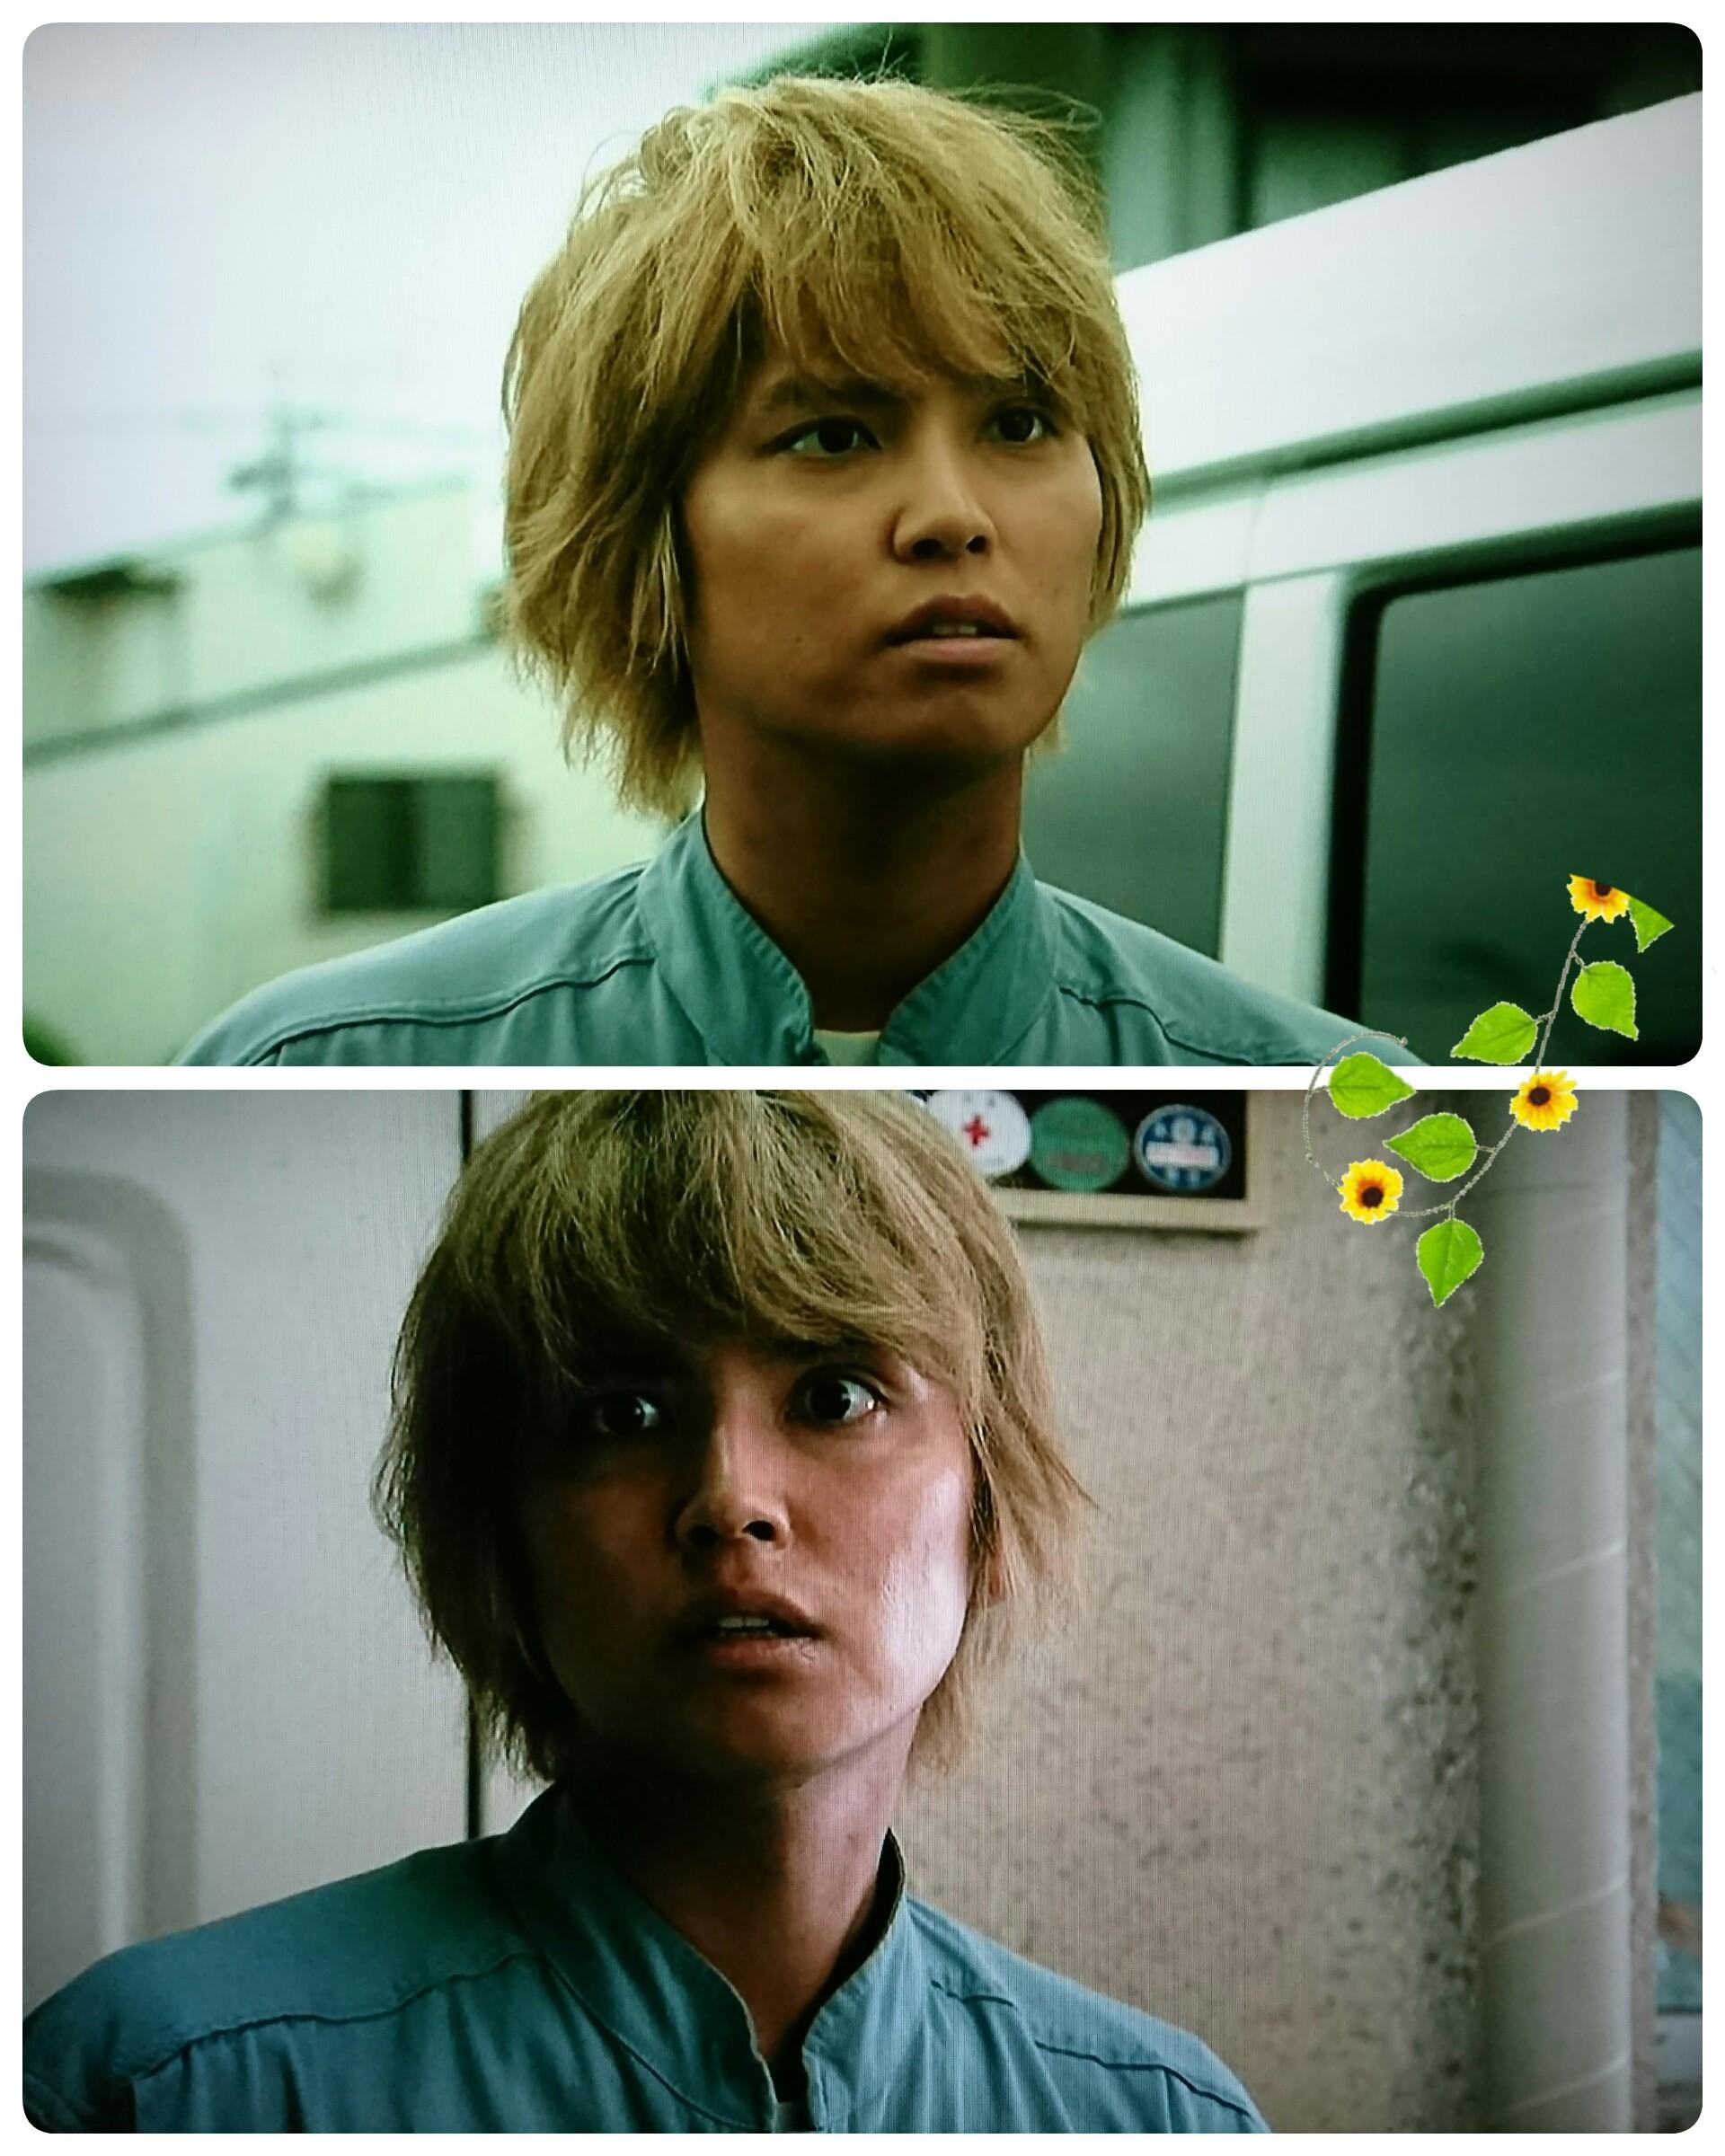 f:id:sunflower-shigeaki:20170831175908j:image